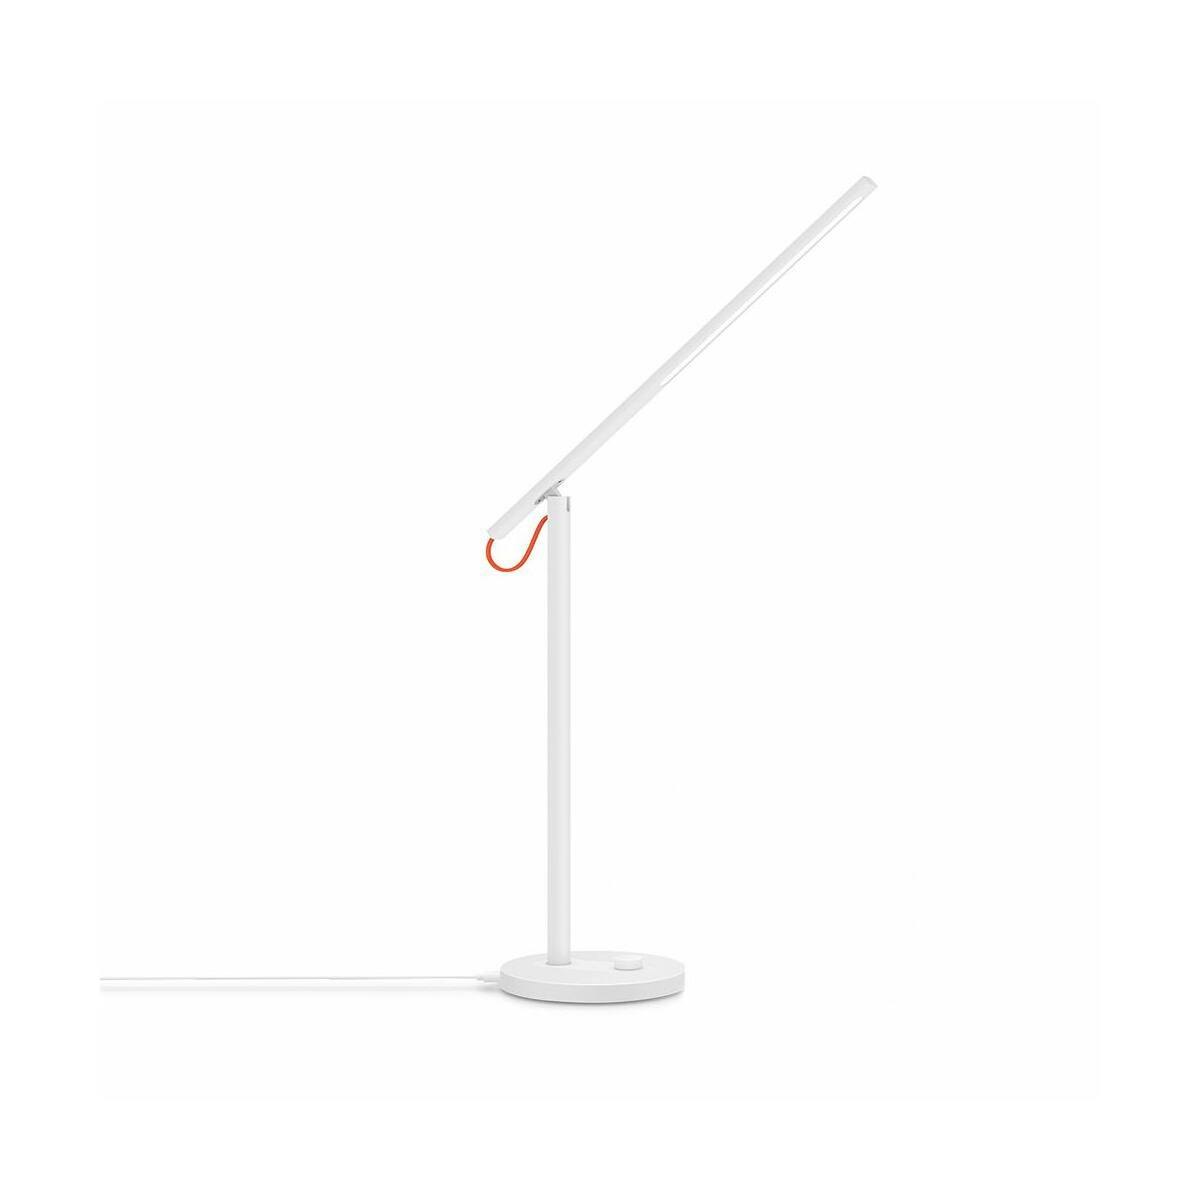 Xiaomi Mi LED asztali lámpa 1S, fehér, EU, MUE4105GL